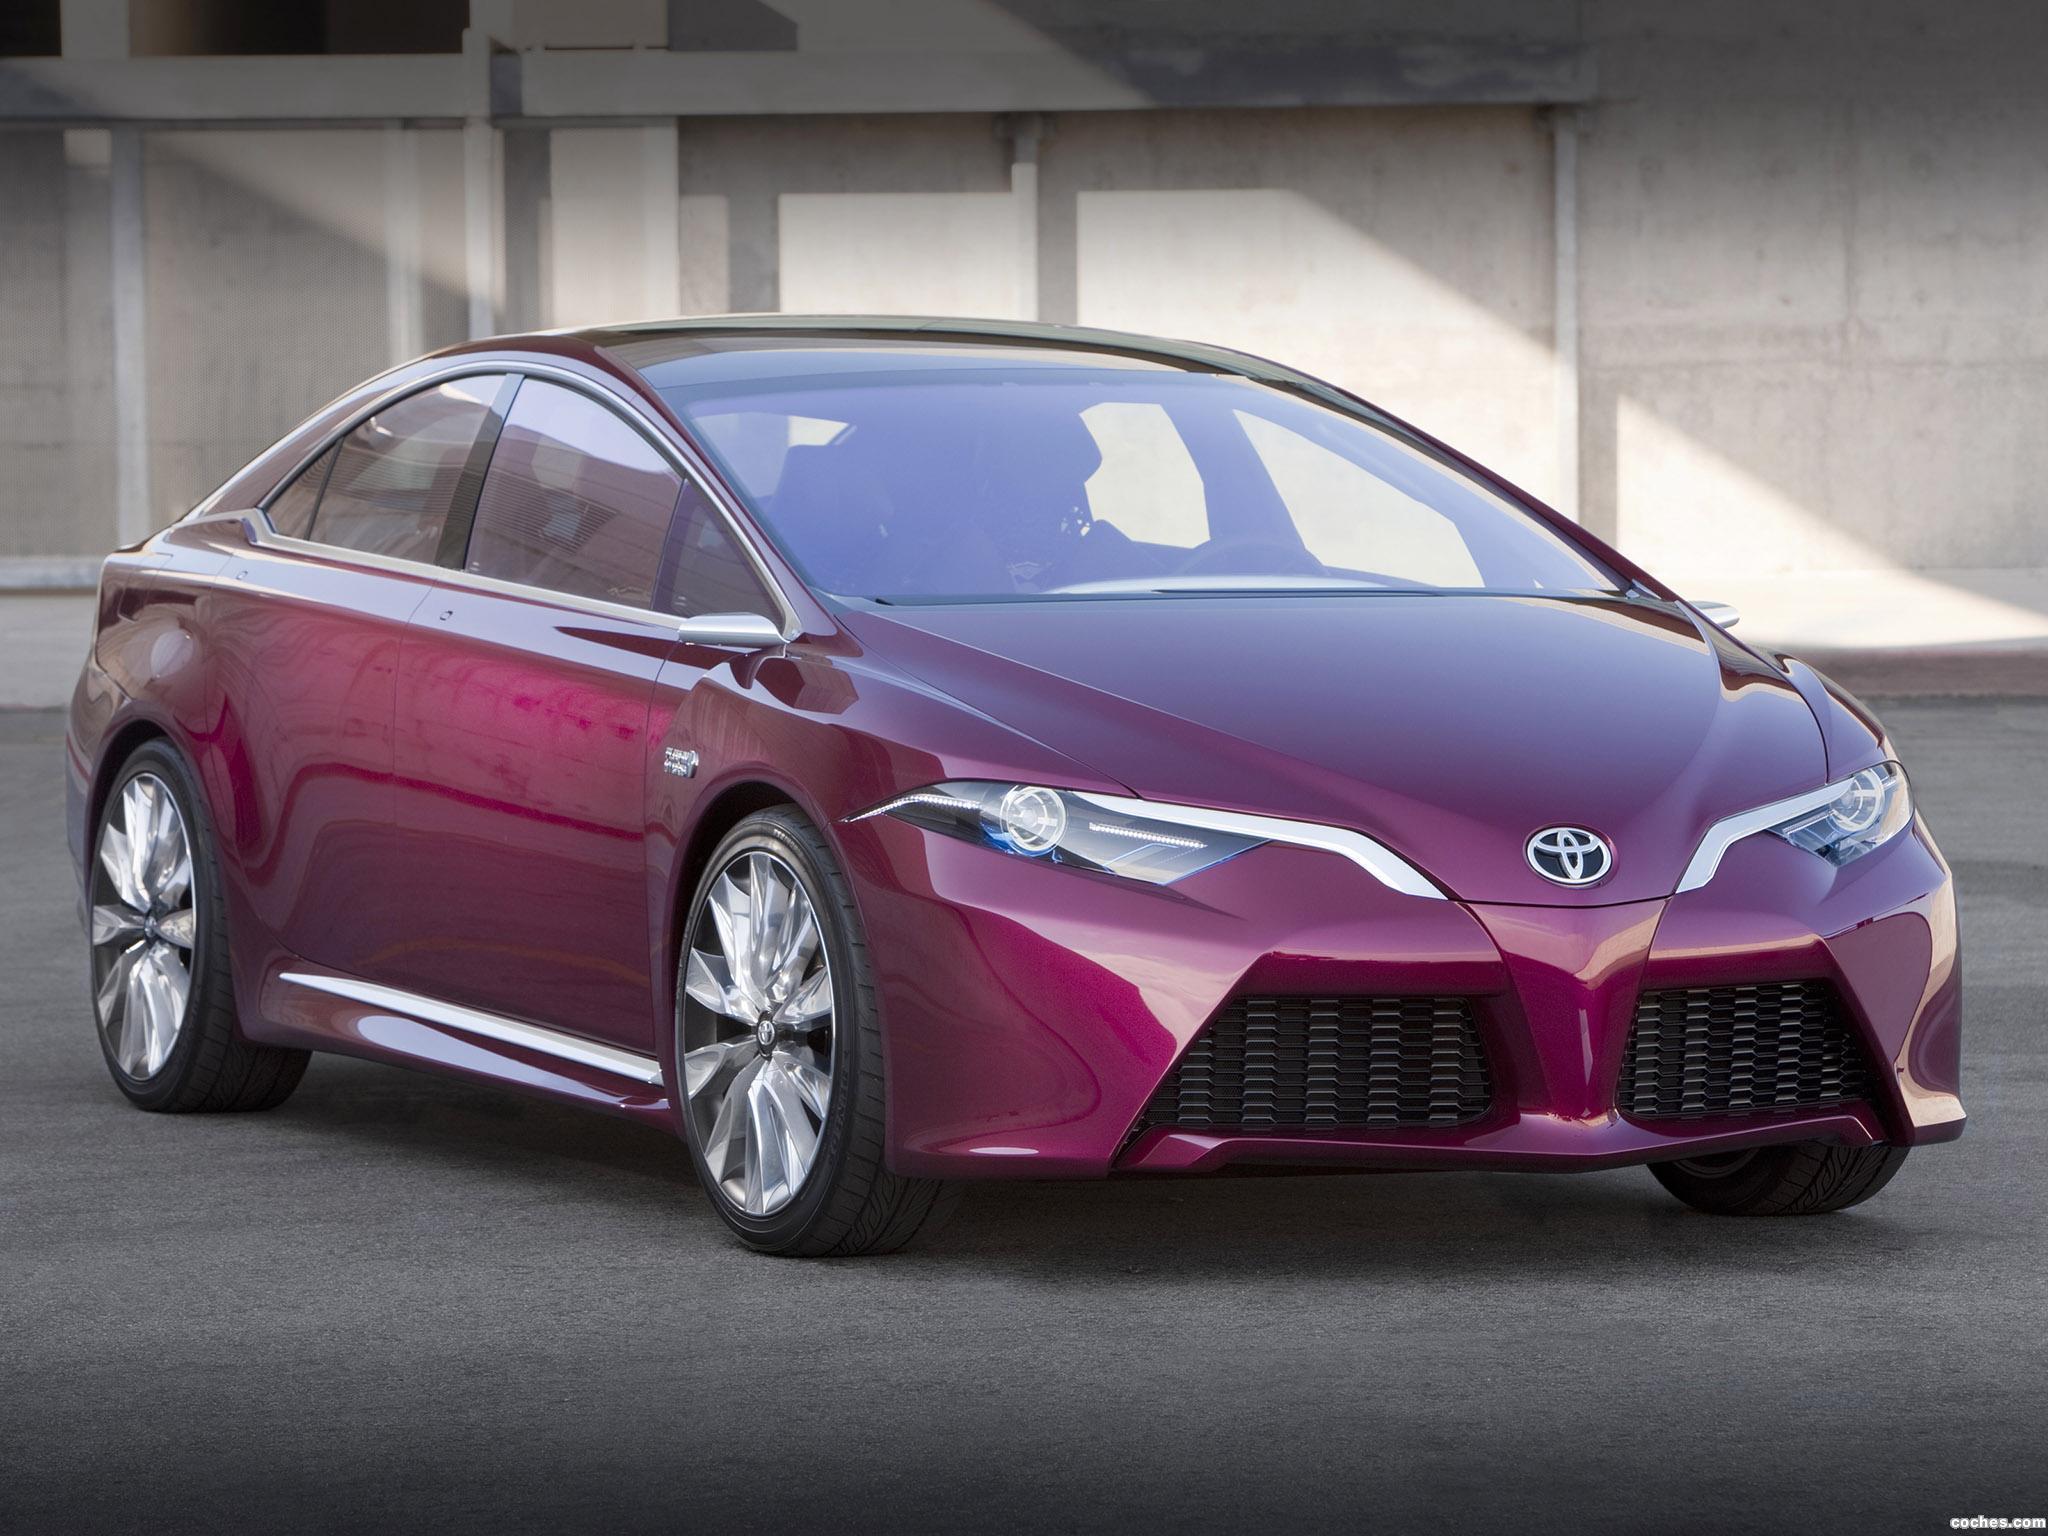 Foto 0 de Toyota NS4 Plug-in Hybrid Concept 2012